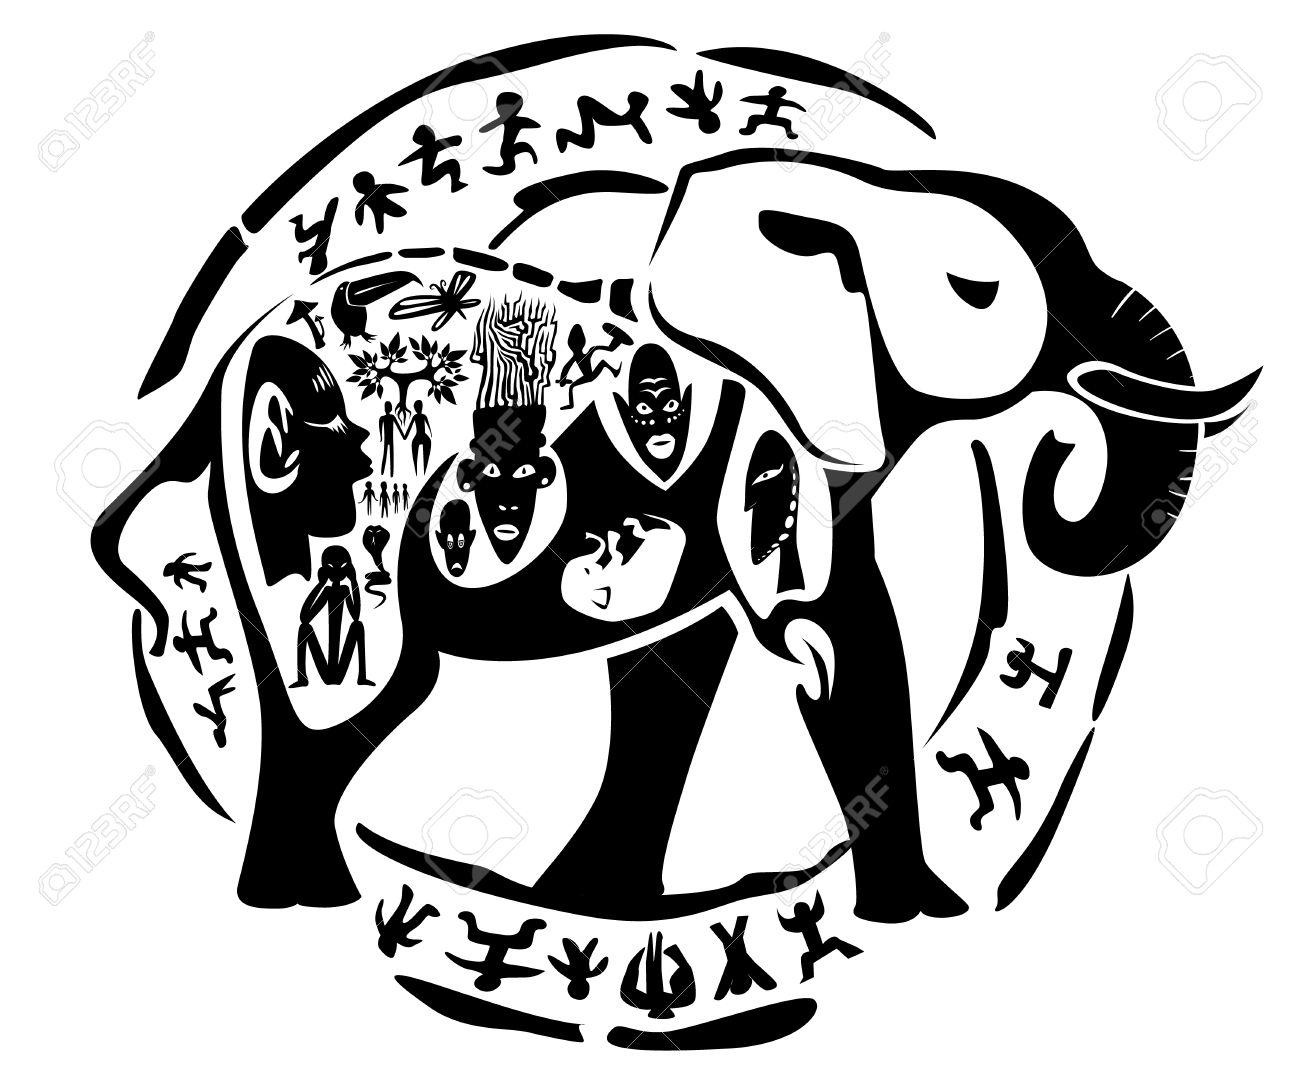 1300x1086 Tribal Elephant, Mammoth Illustration, Tattoo Stamp Royalty Free